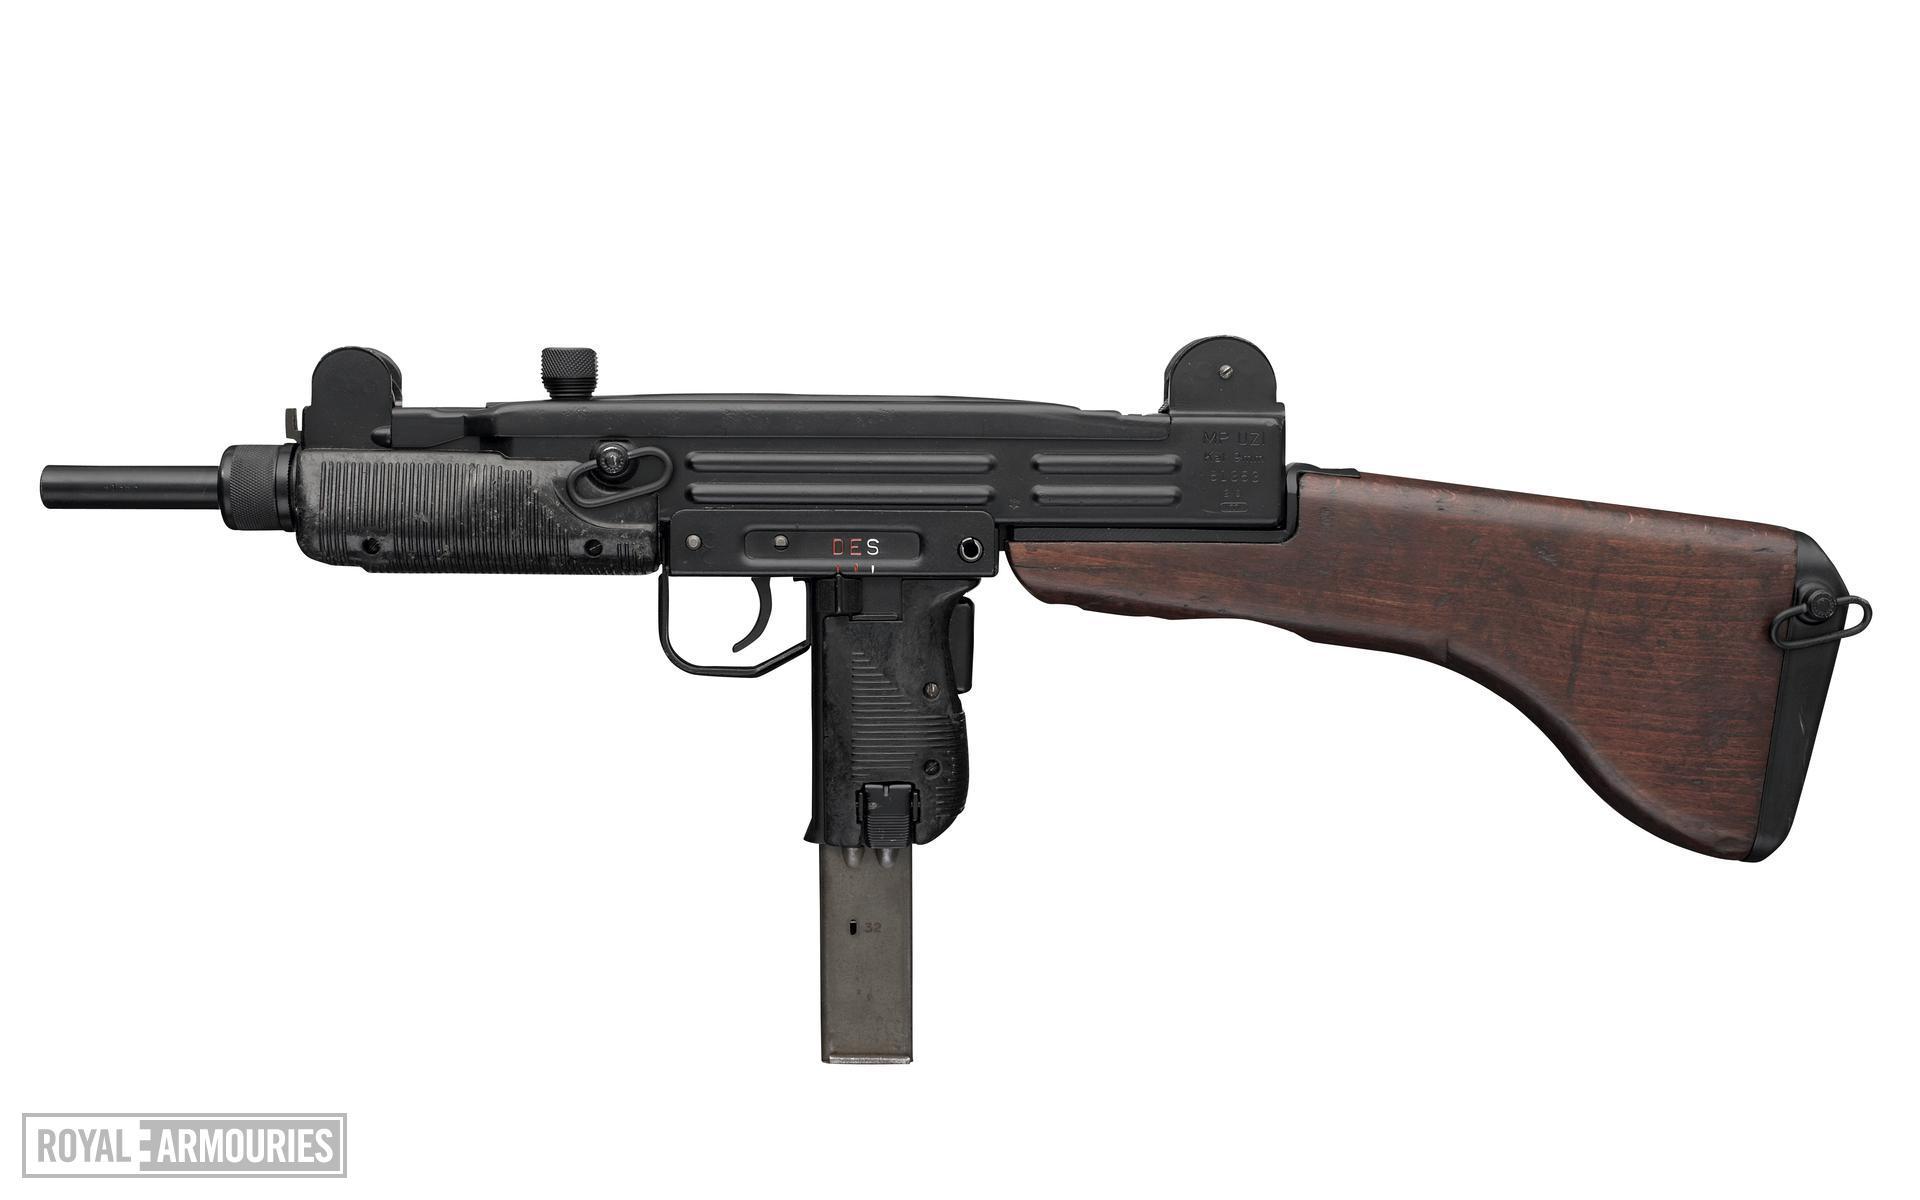 Centrefire automatic submachine gun - Uzi